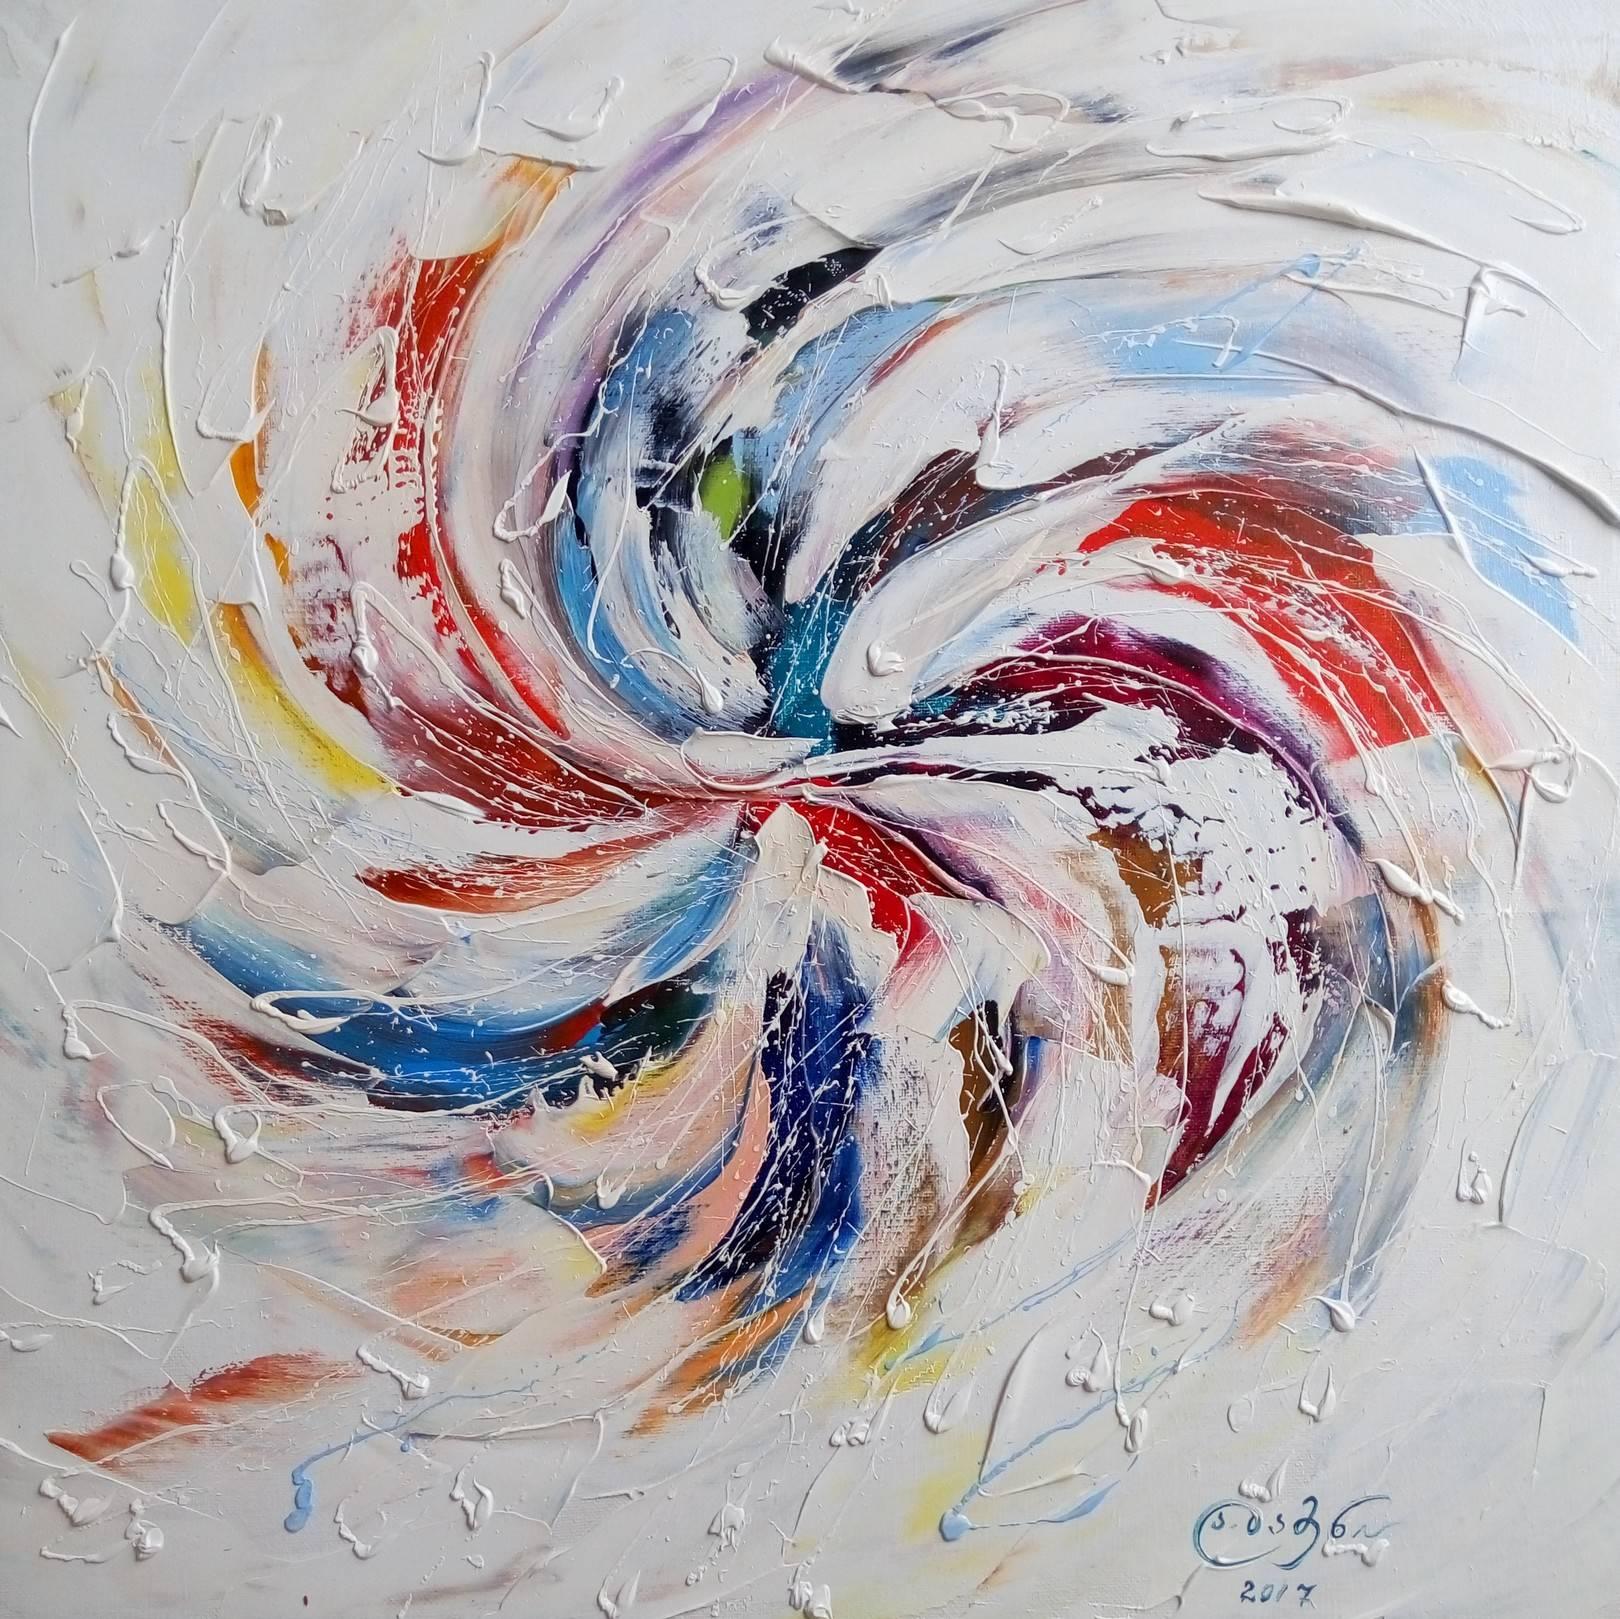 «Пробуждение голубого солнца»   холст, масло «Awakening of the blue sun»            oil on canvas  50x50, 2017